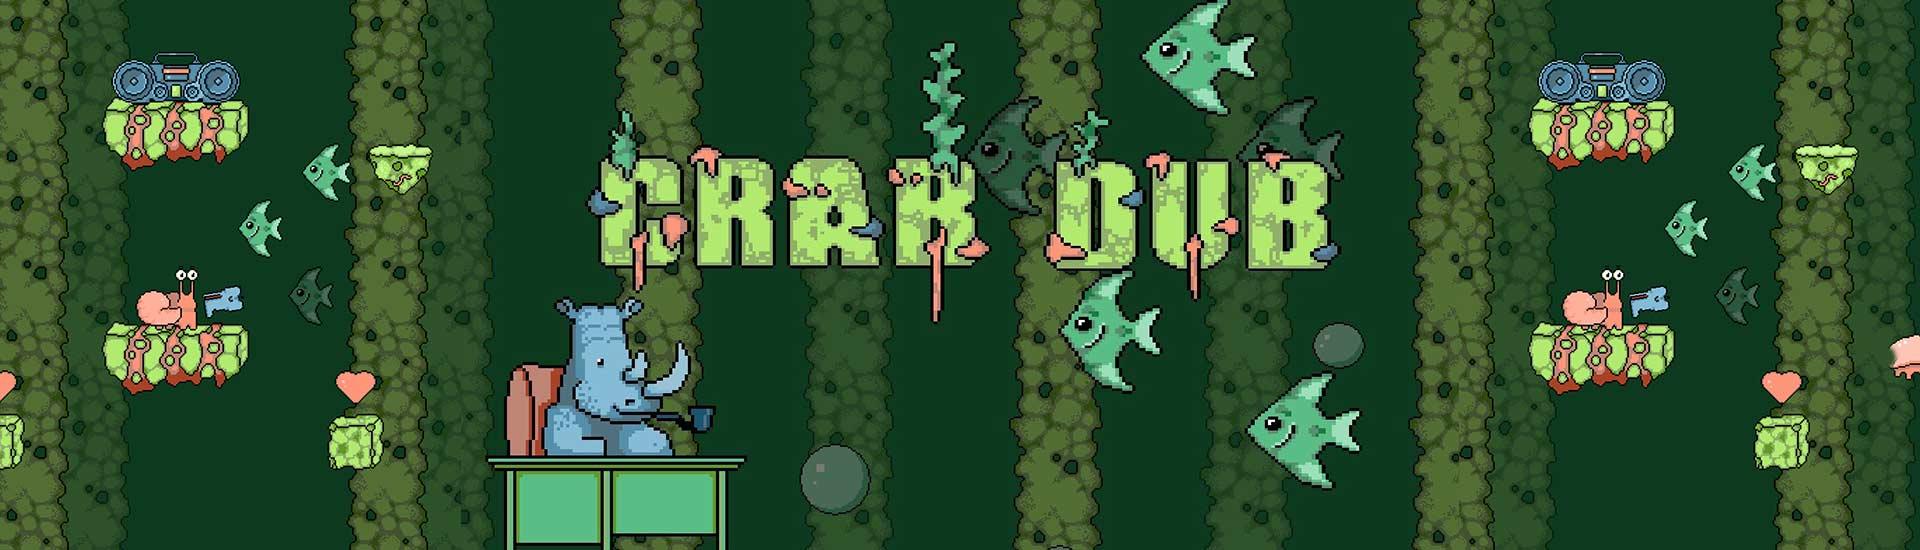 Juego Gratis: Crab Dub